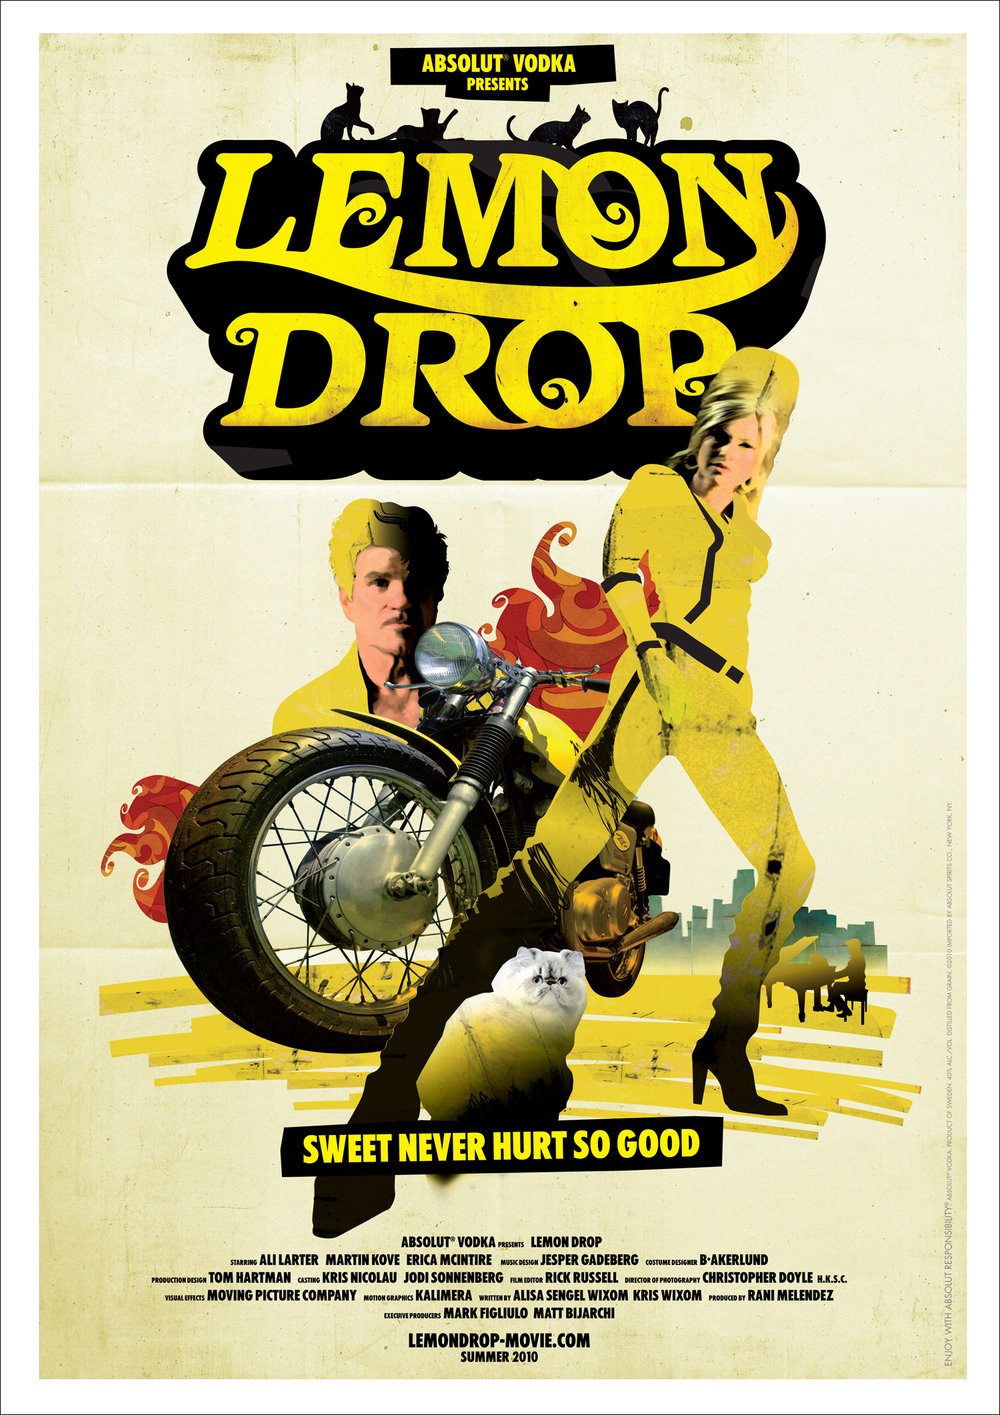 Lemon Drop Poster Small stroke.jpg